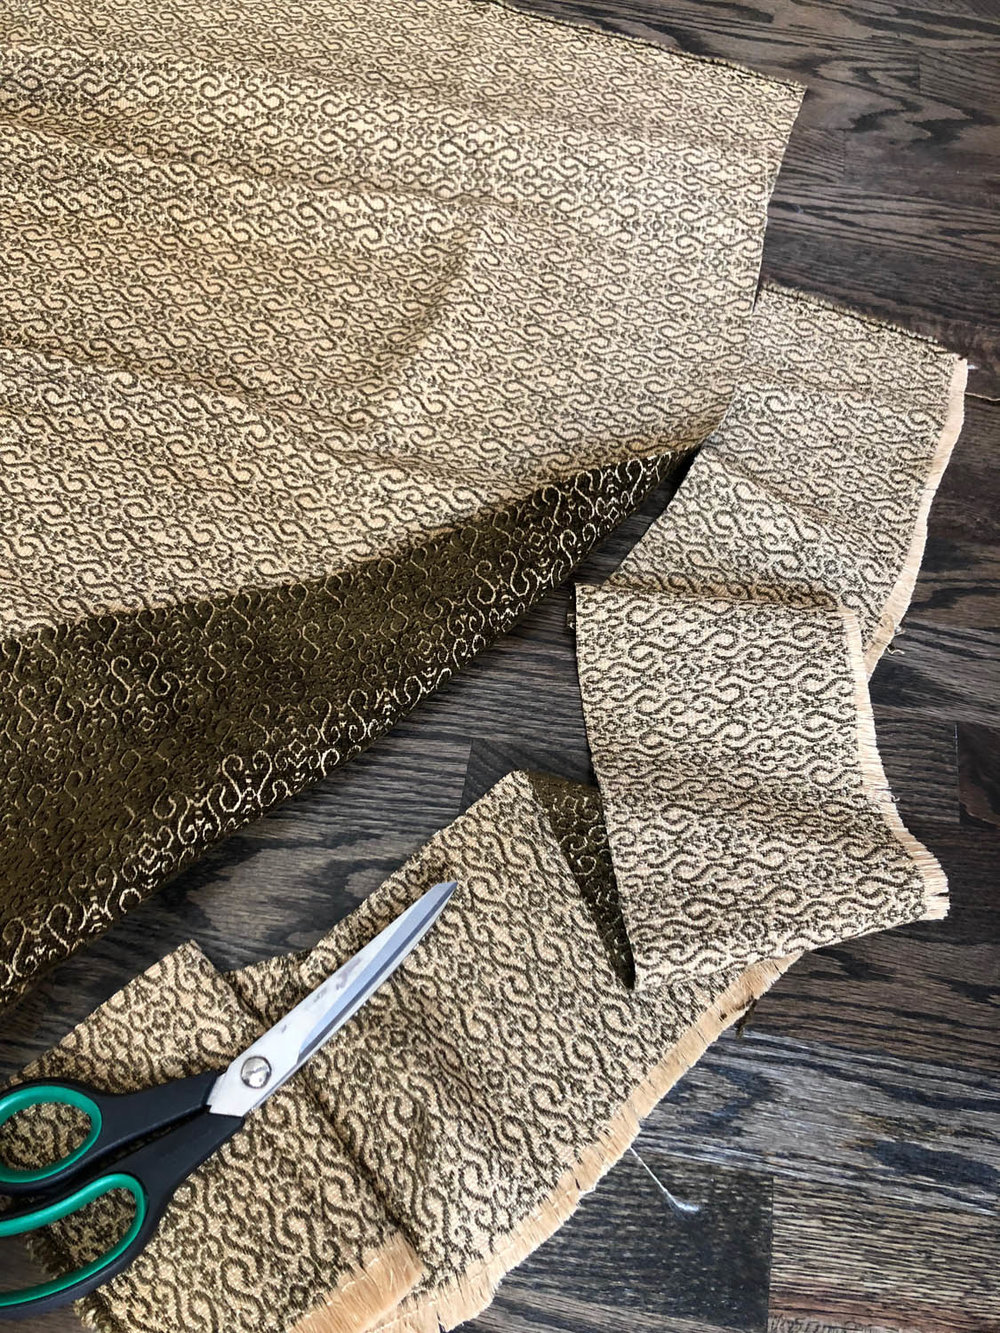 scissors cutting away edge of upholstery fabric